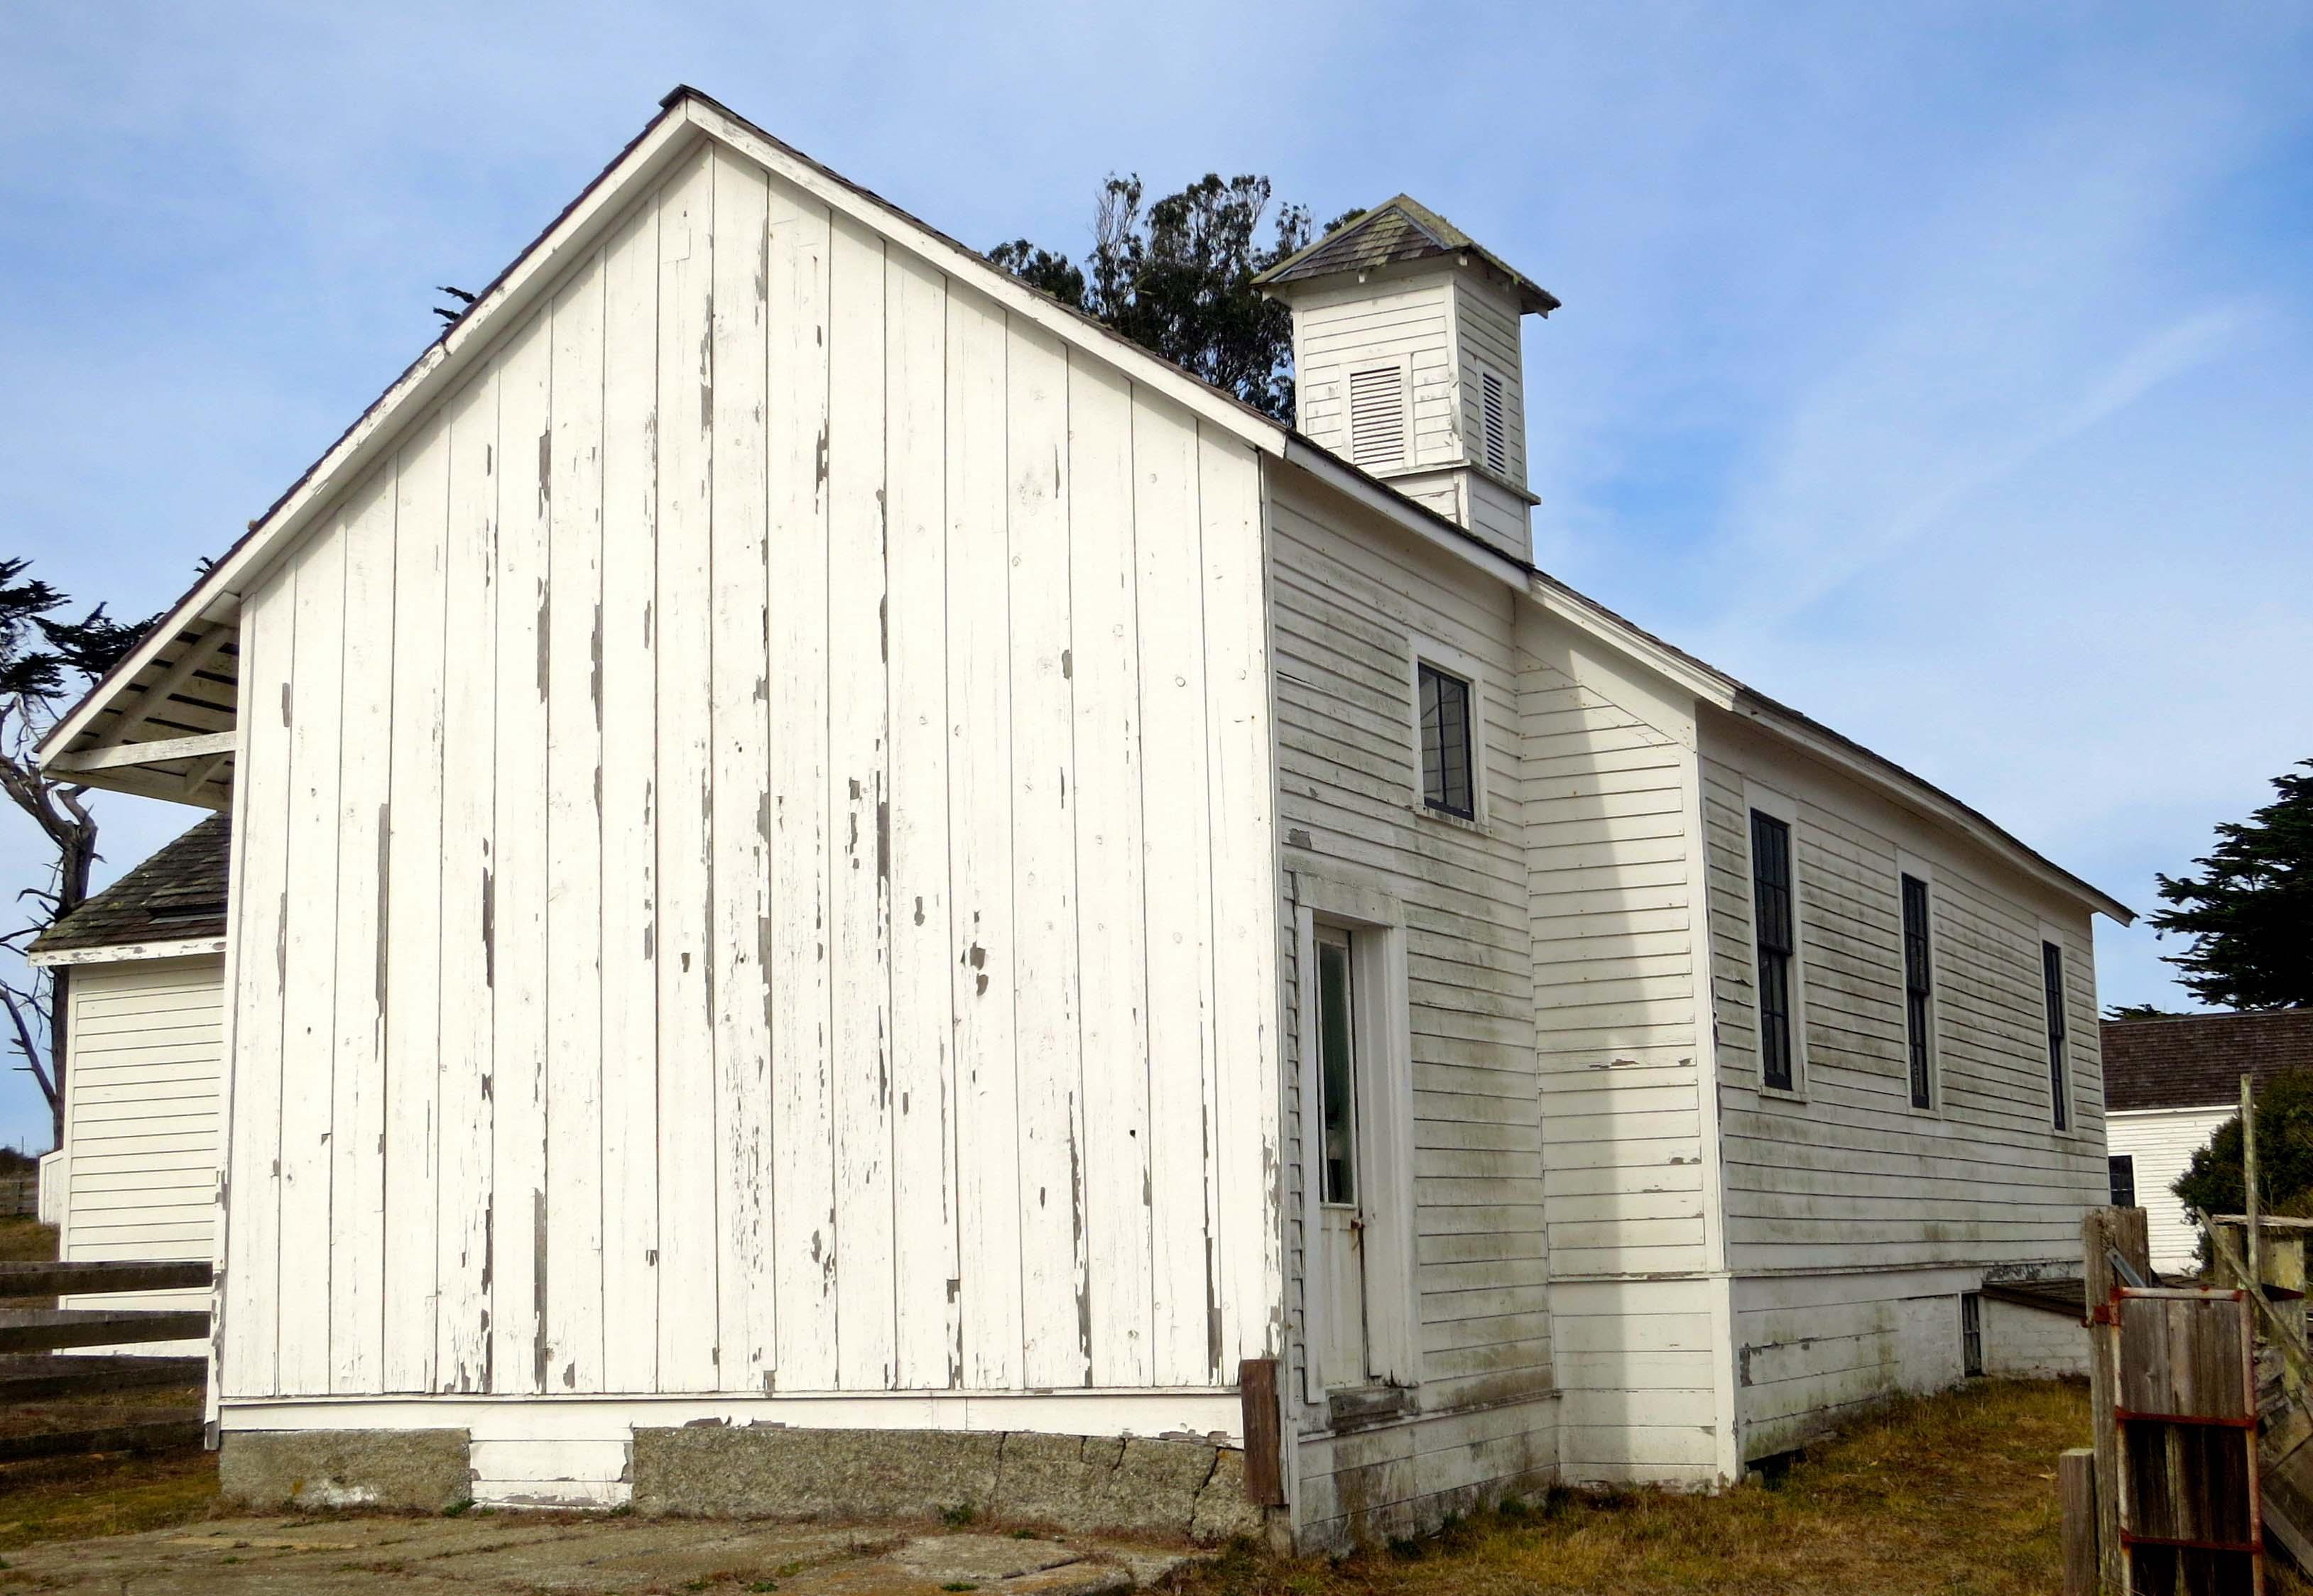 Photo of dairy house at Pierce Ranch, Pt. Reyes National Seashore by Curtis Mekemson.